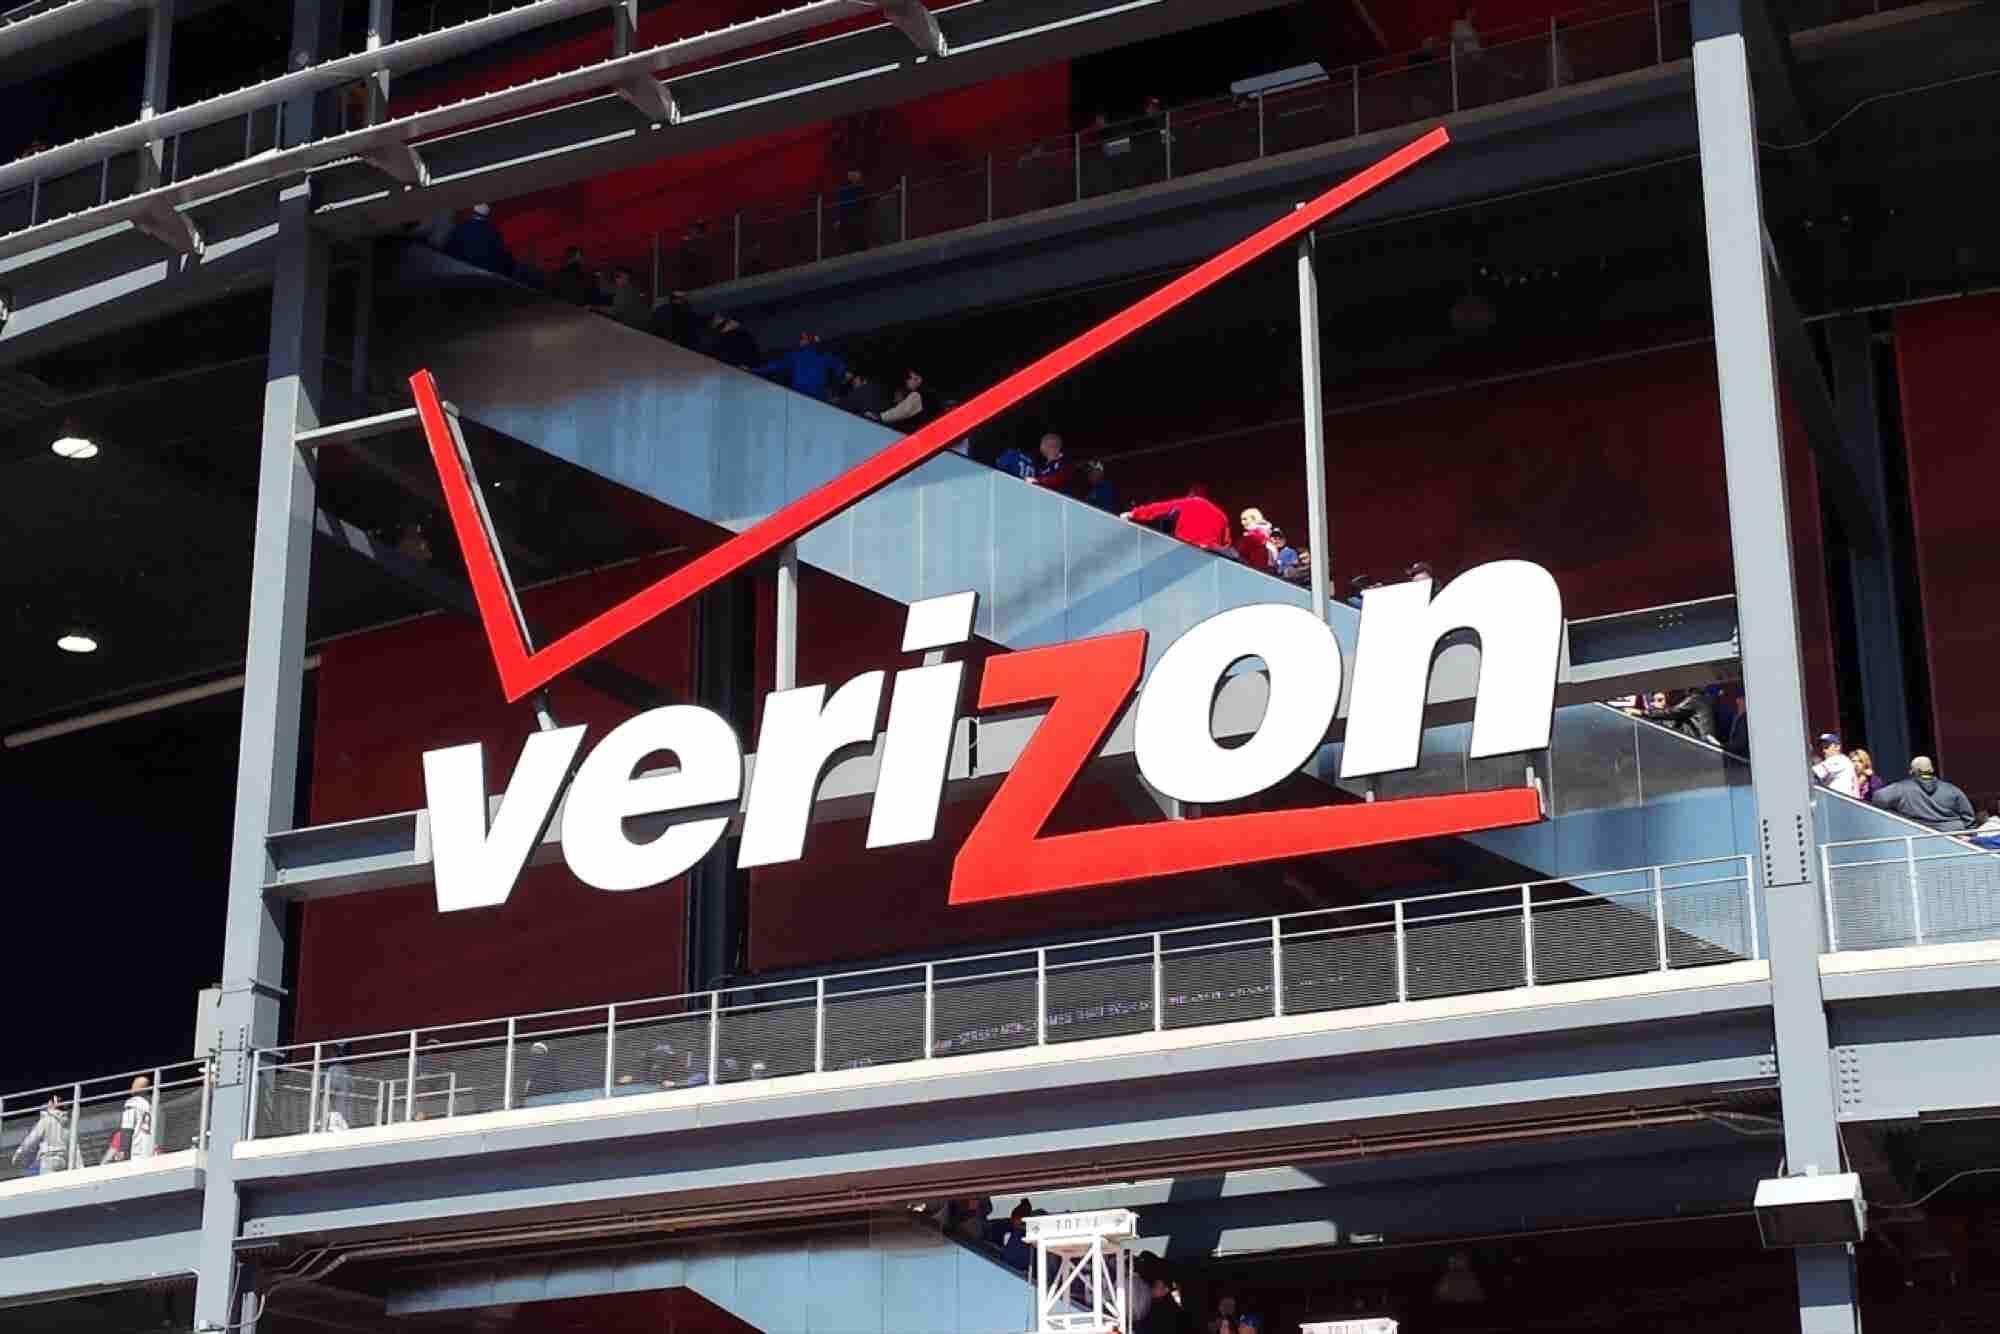 No Strike for Now as Verizon, Unions Continue to Negotiate